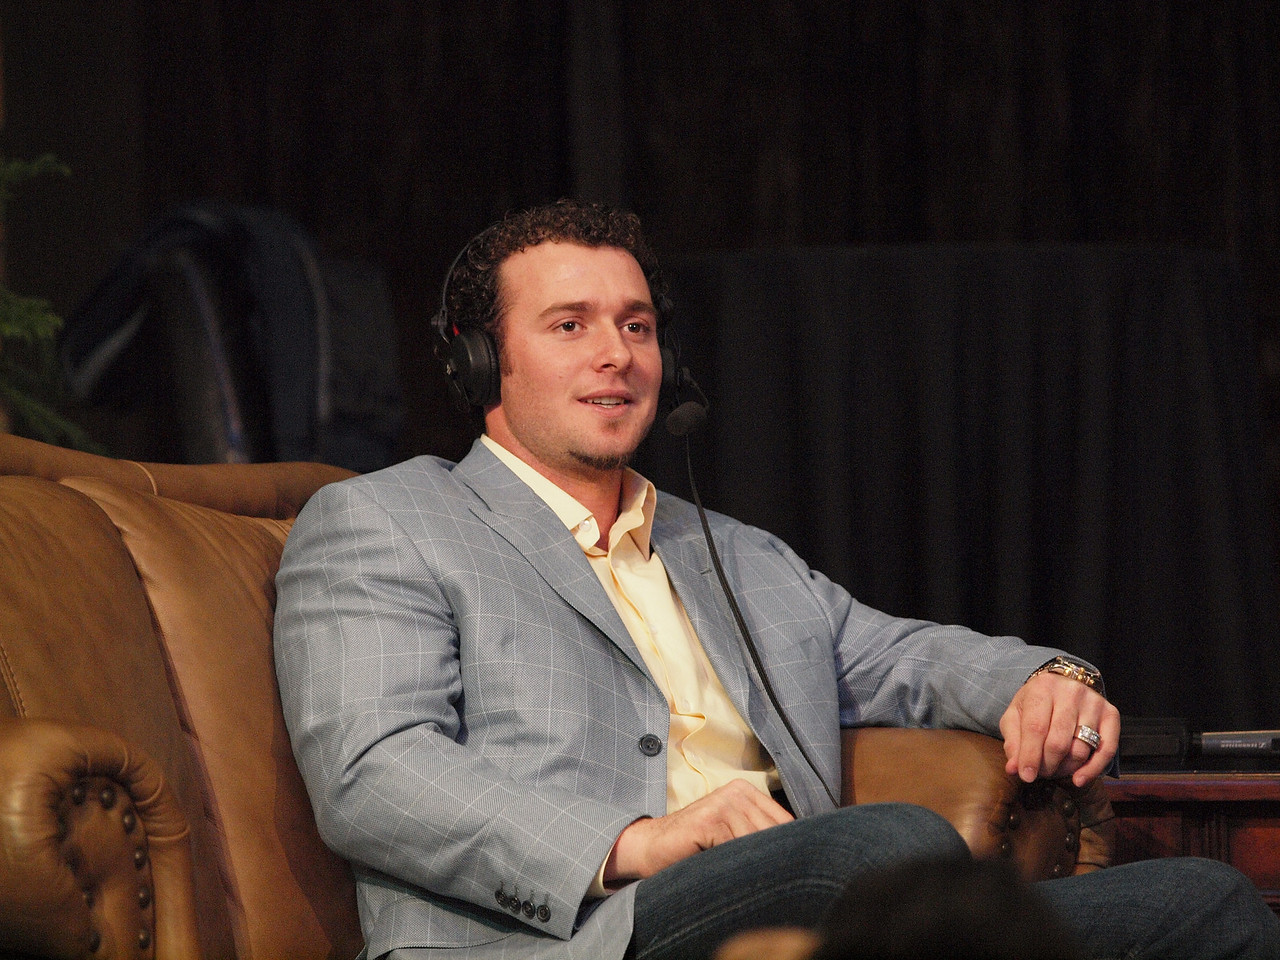 Jarrod Saltalamacchia, catcher with the Texas Rangers